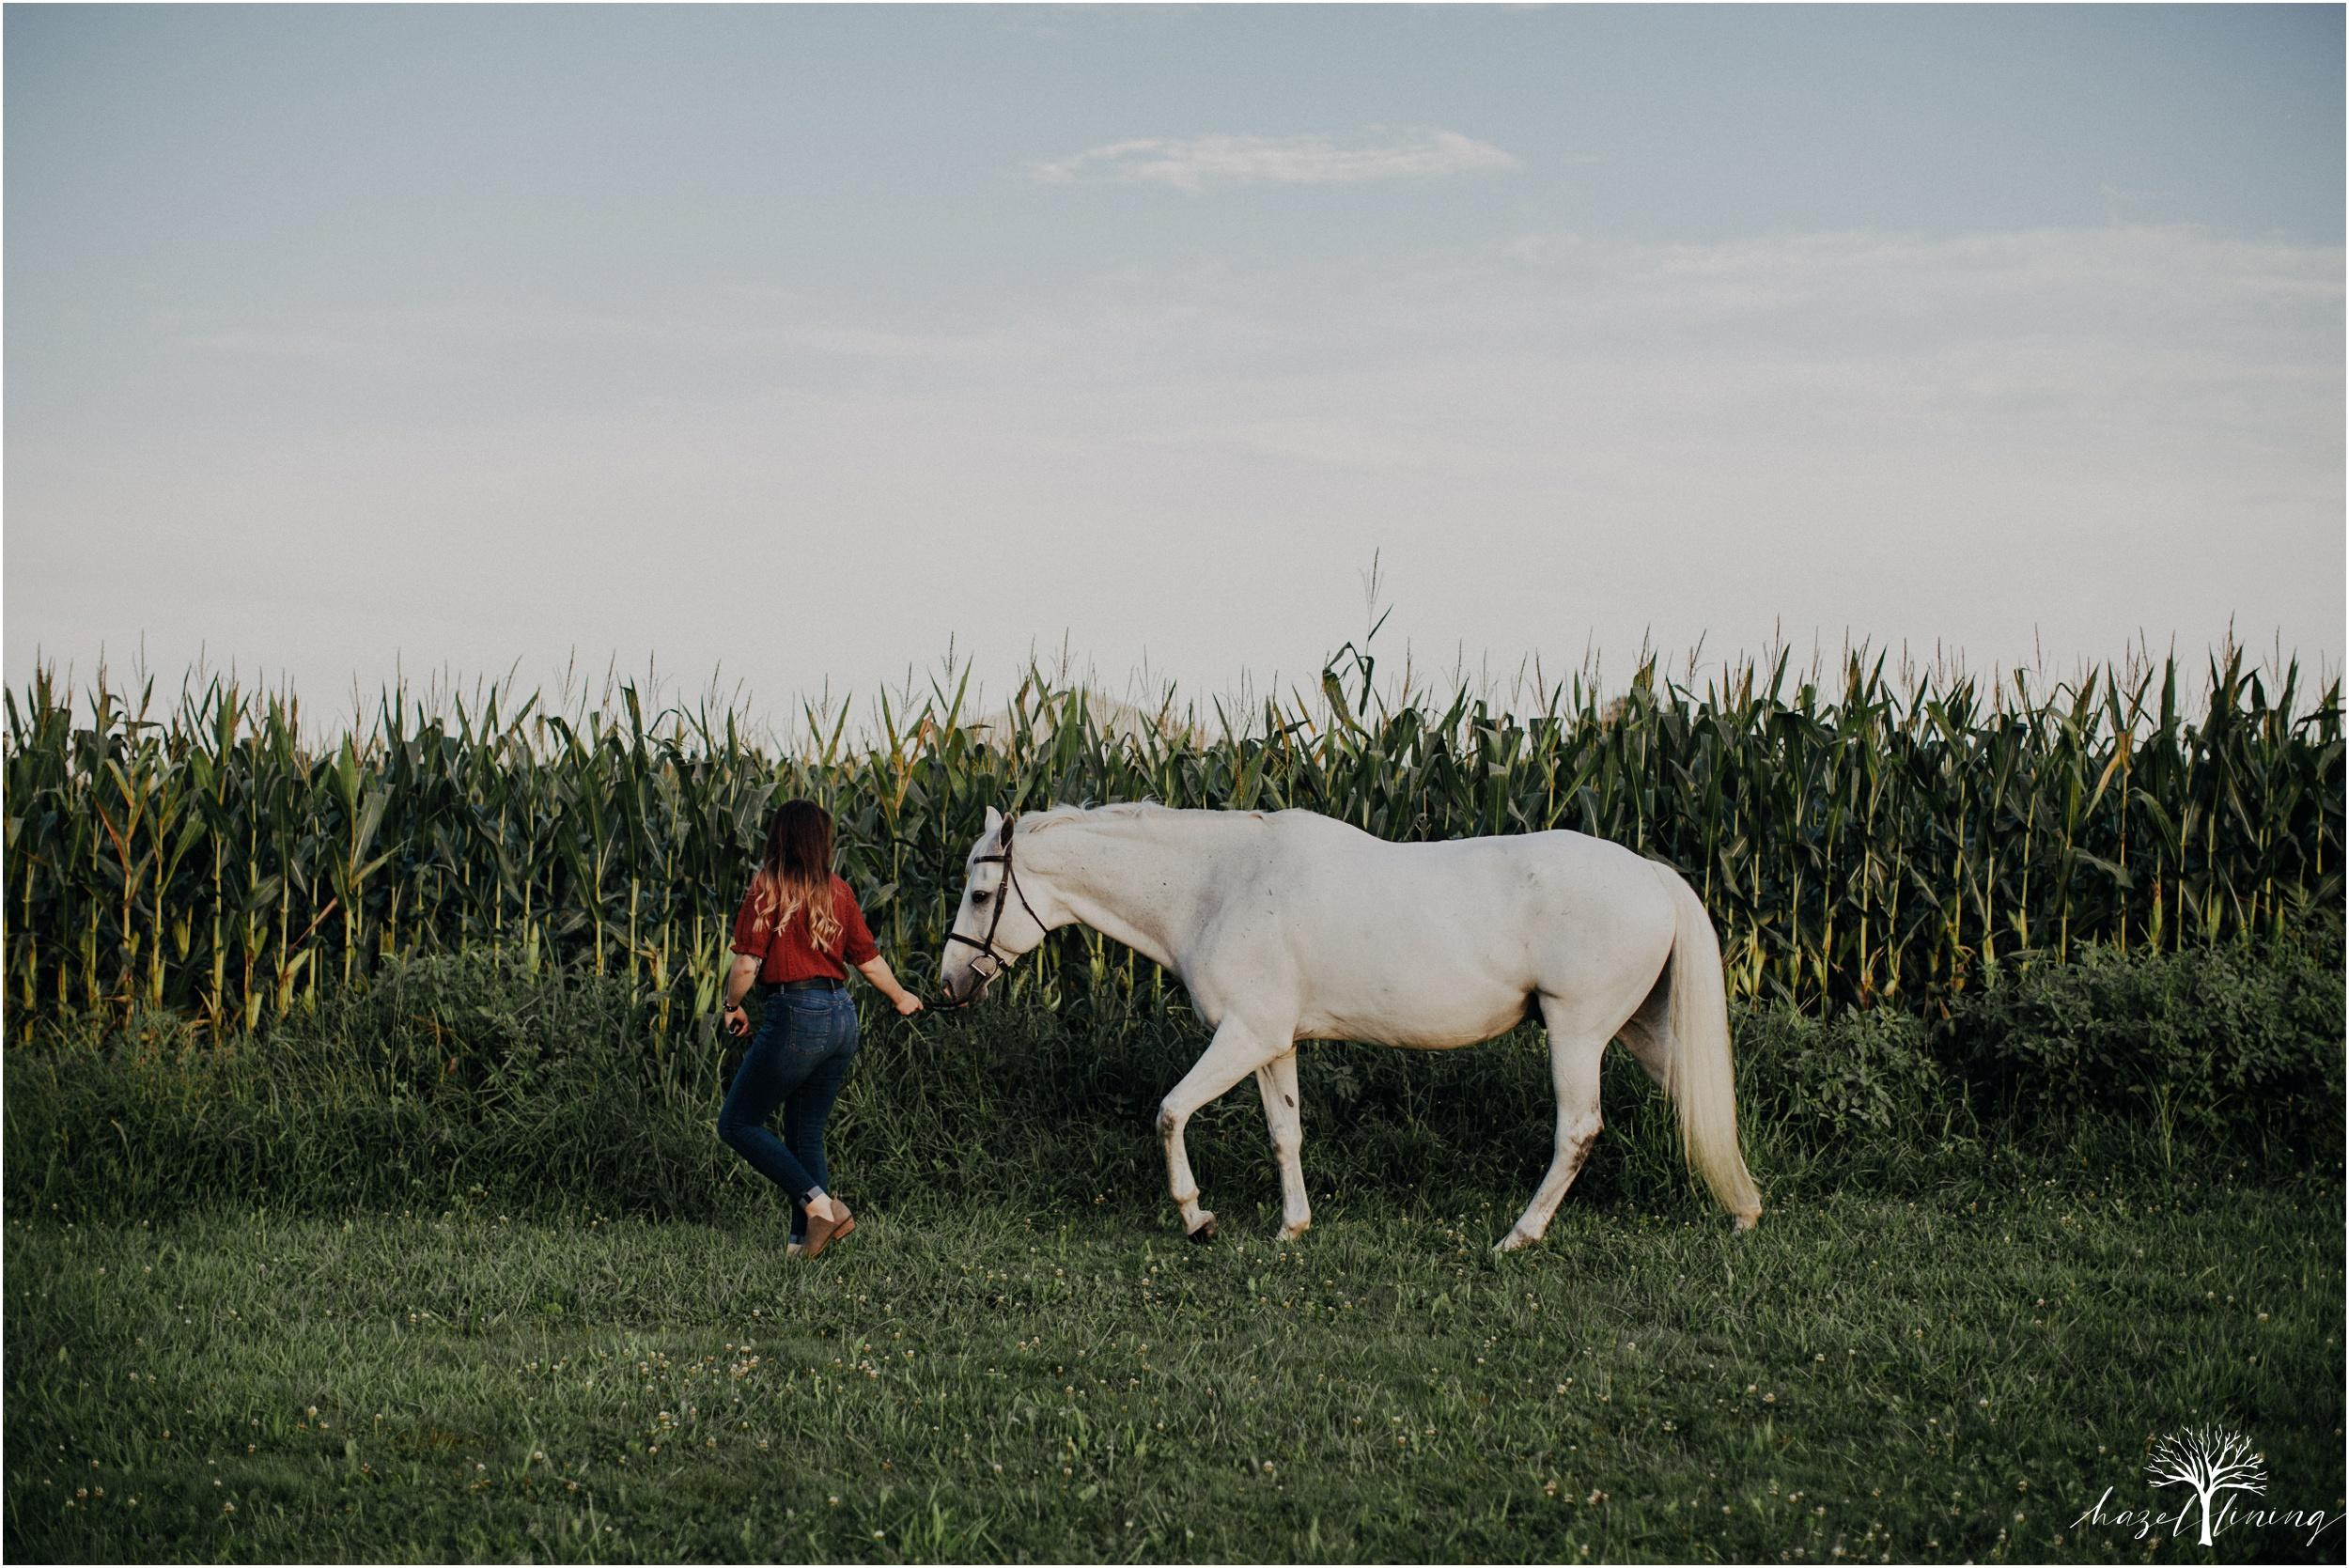 taylor-adams-and-horse-delaware-valley-university-delval-summer-equestrian-portrait-session-hazel-lining-photography-destination-elopement-wedding-engagement-photography_0024.jpg